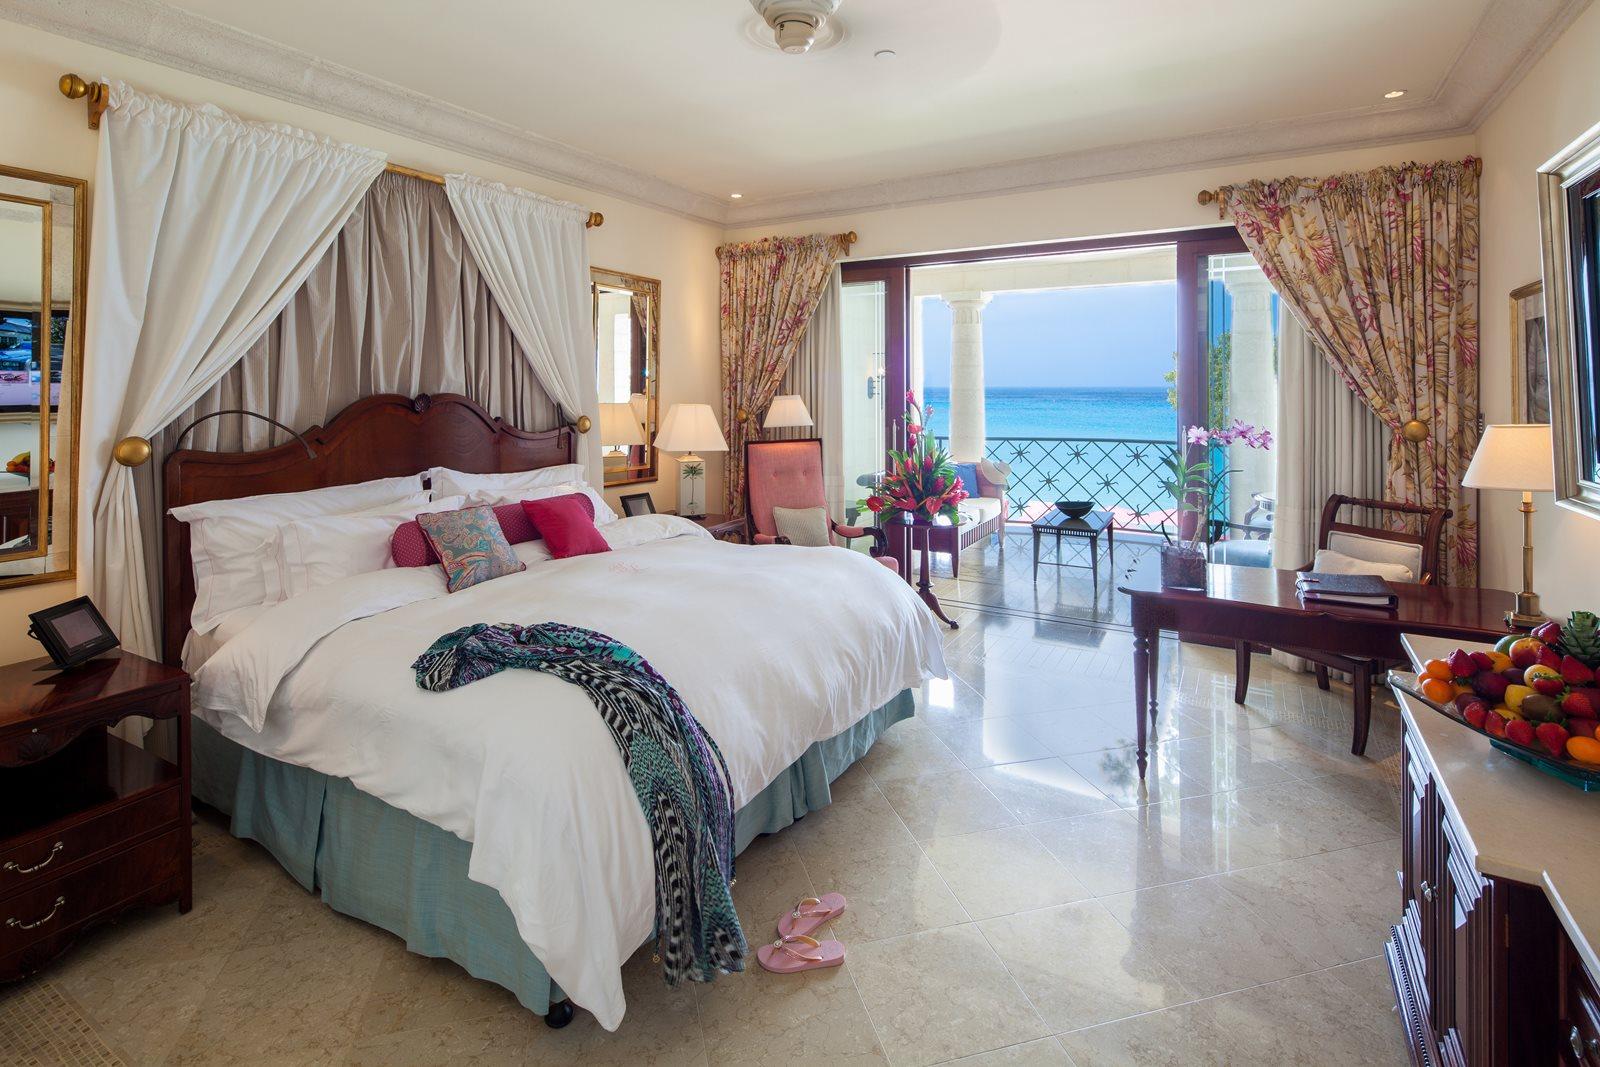 Be Resort Room Rates